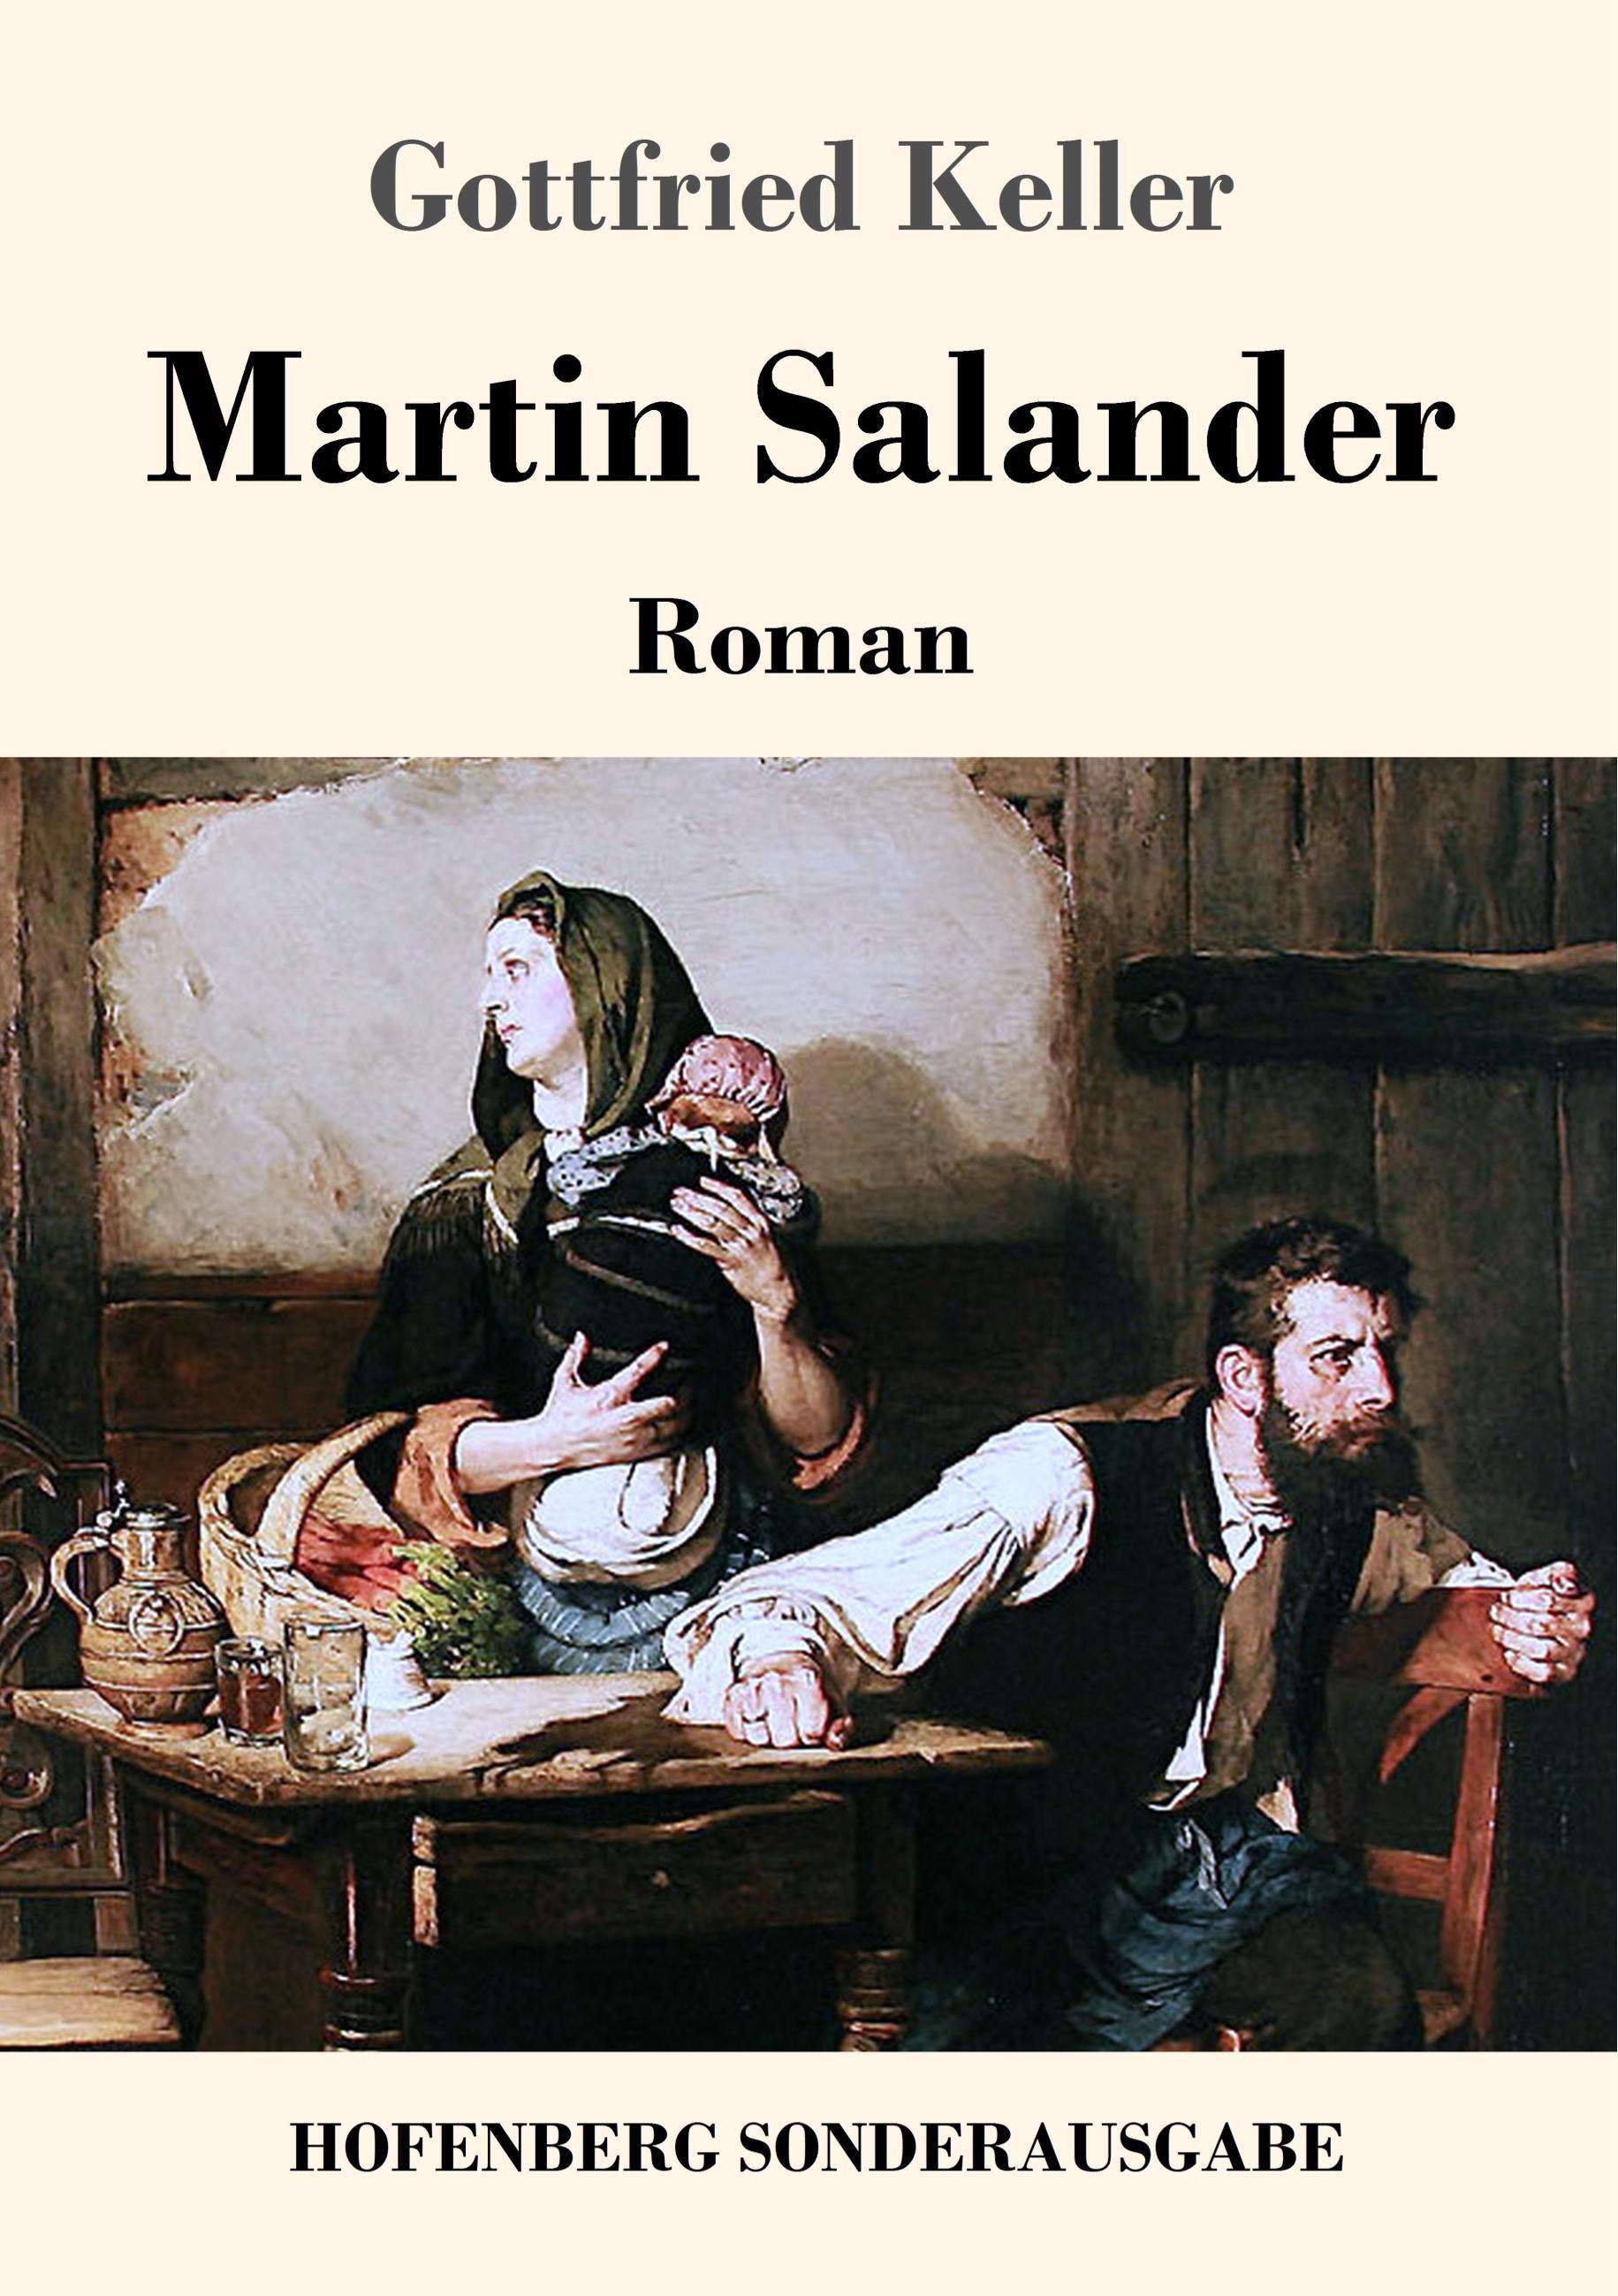 Martin Salander - Keller, Gottfried